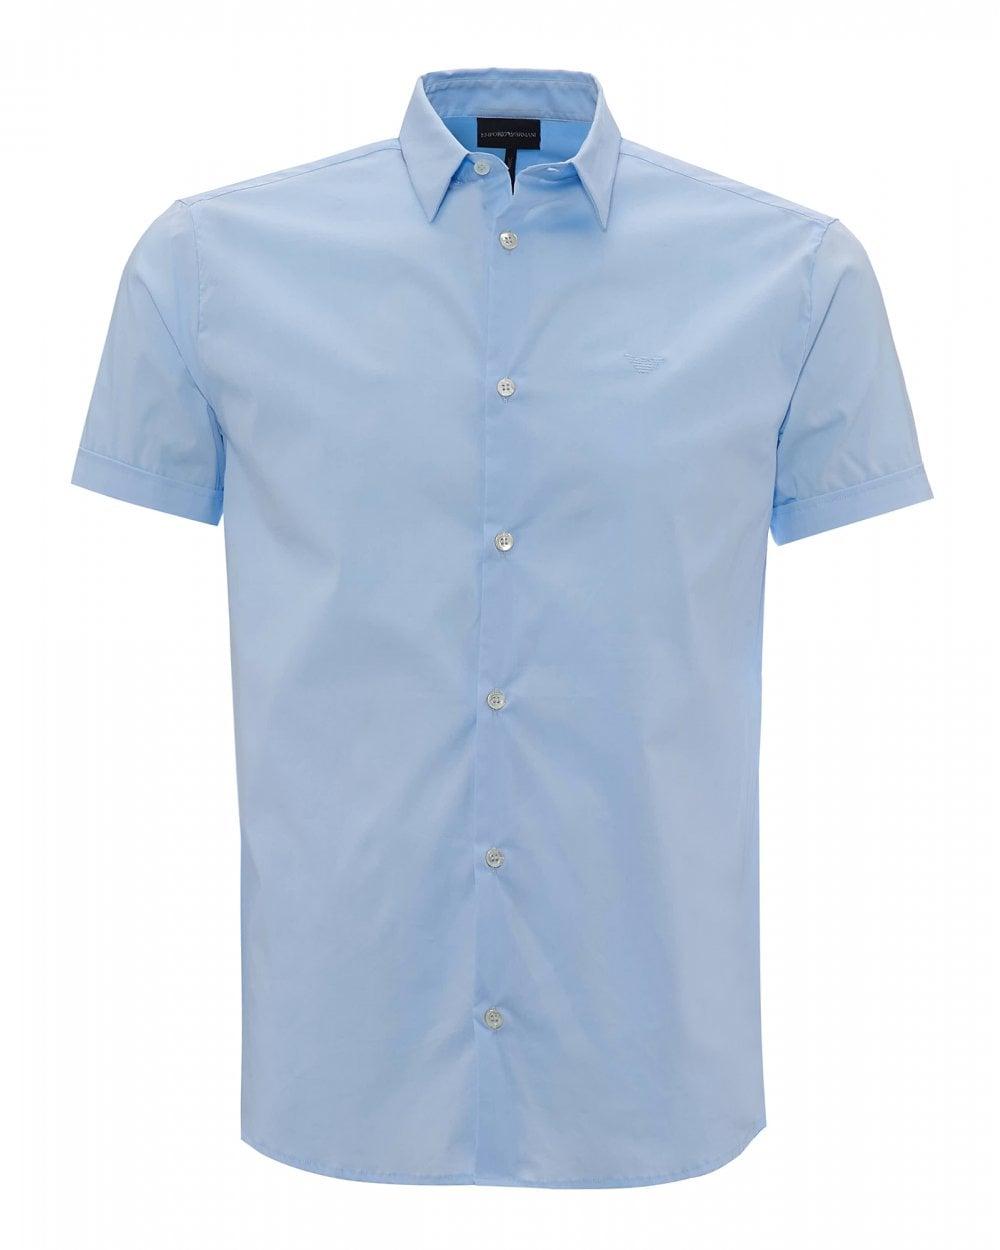 94cd6eb3 Emporio Armani Mens Slim Fit Sky Blue Poplin Stretch Shirt